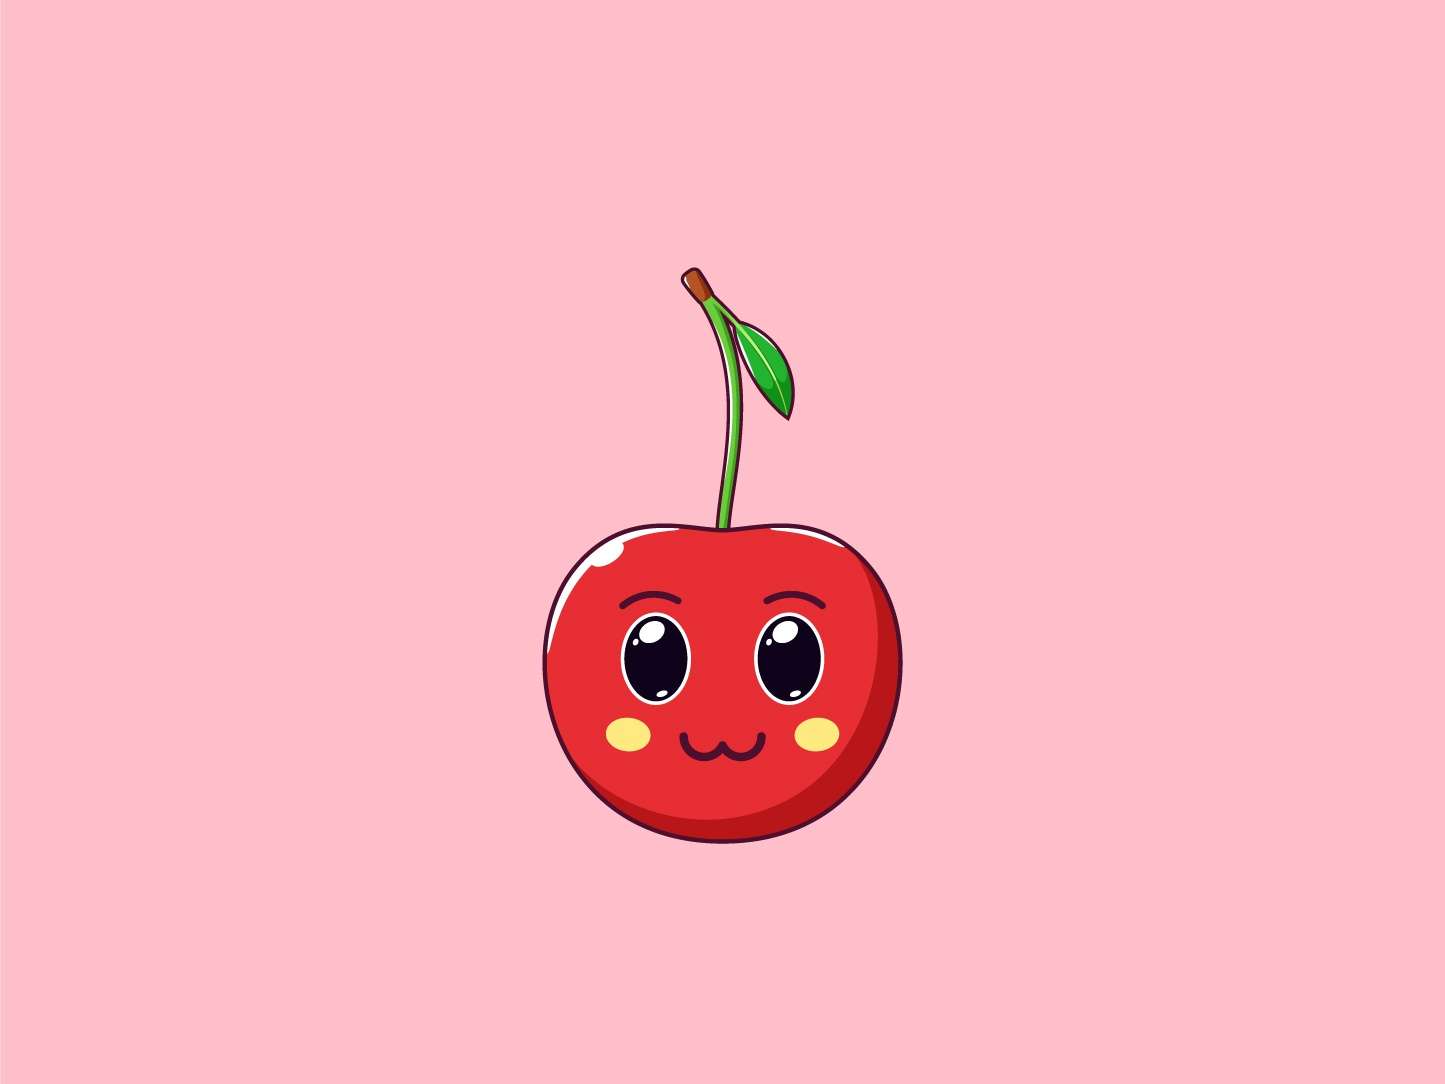 Cute Kawaii Cherry, Cartoon Fruit vector summer sticker smile cherry kawaii illustration fruit face emoji cute cartoon